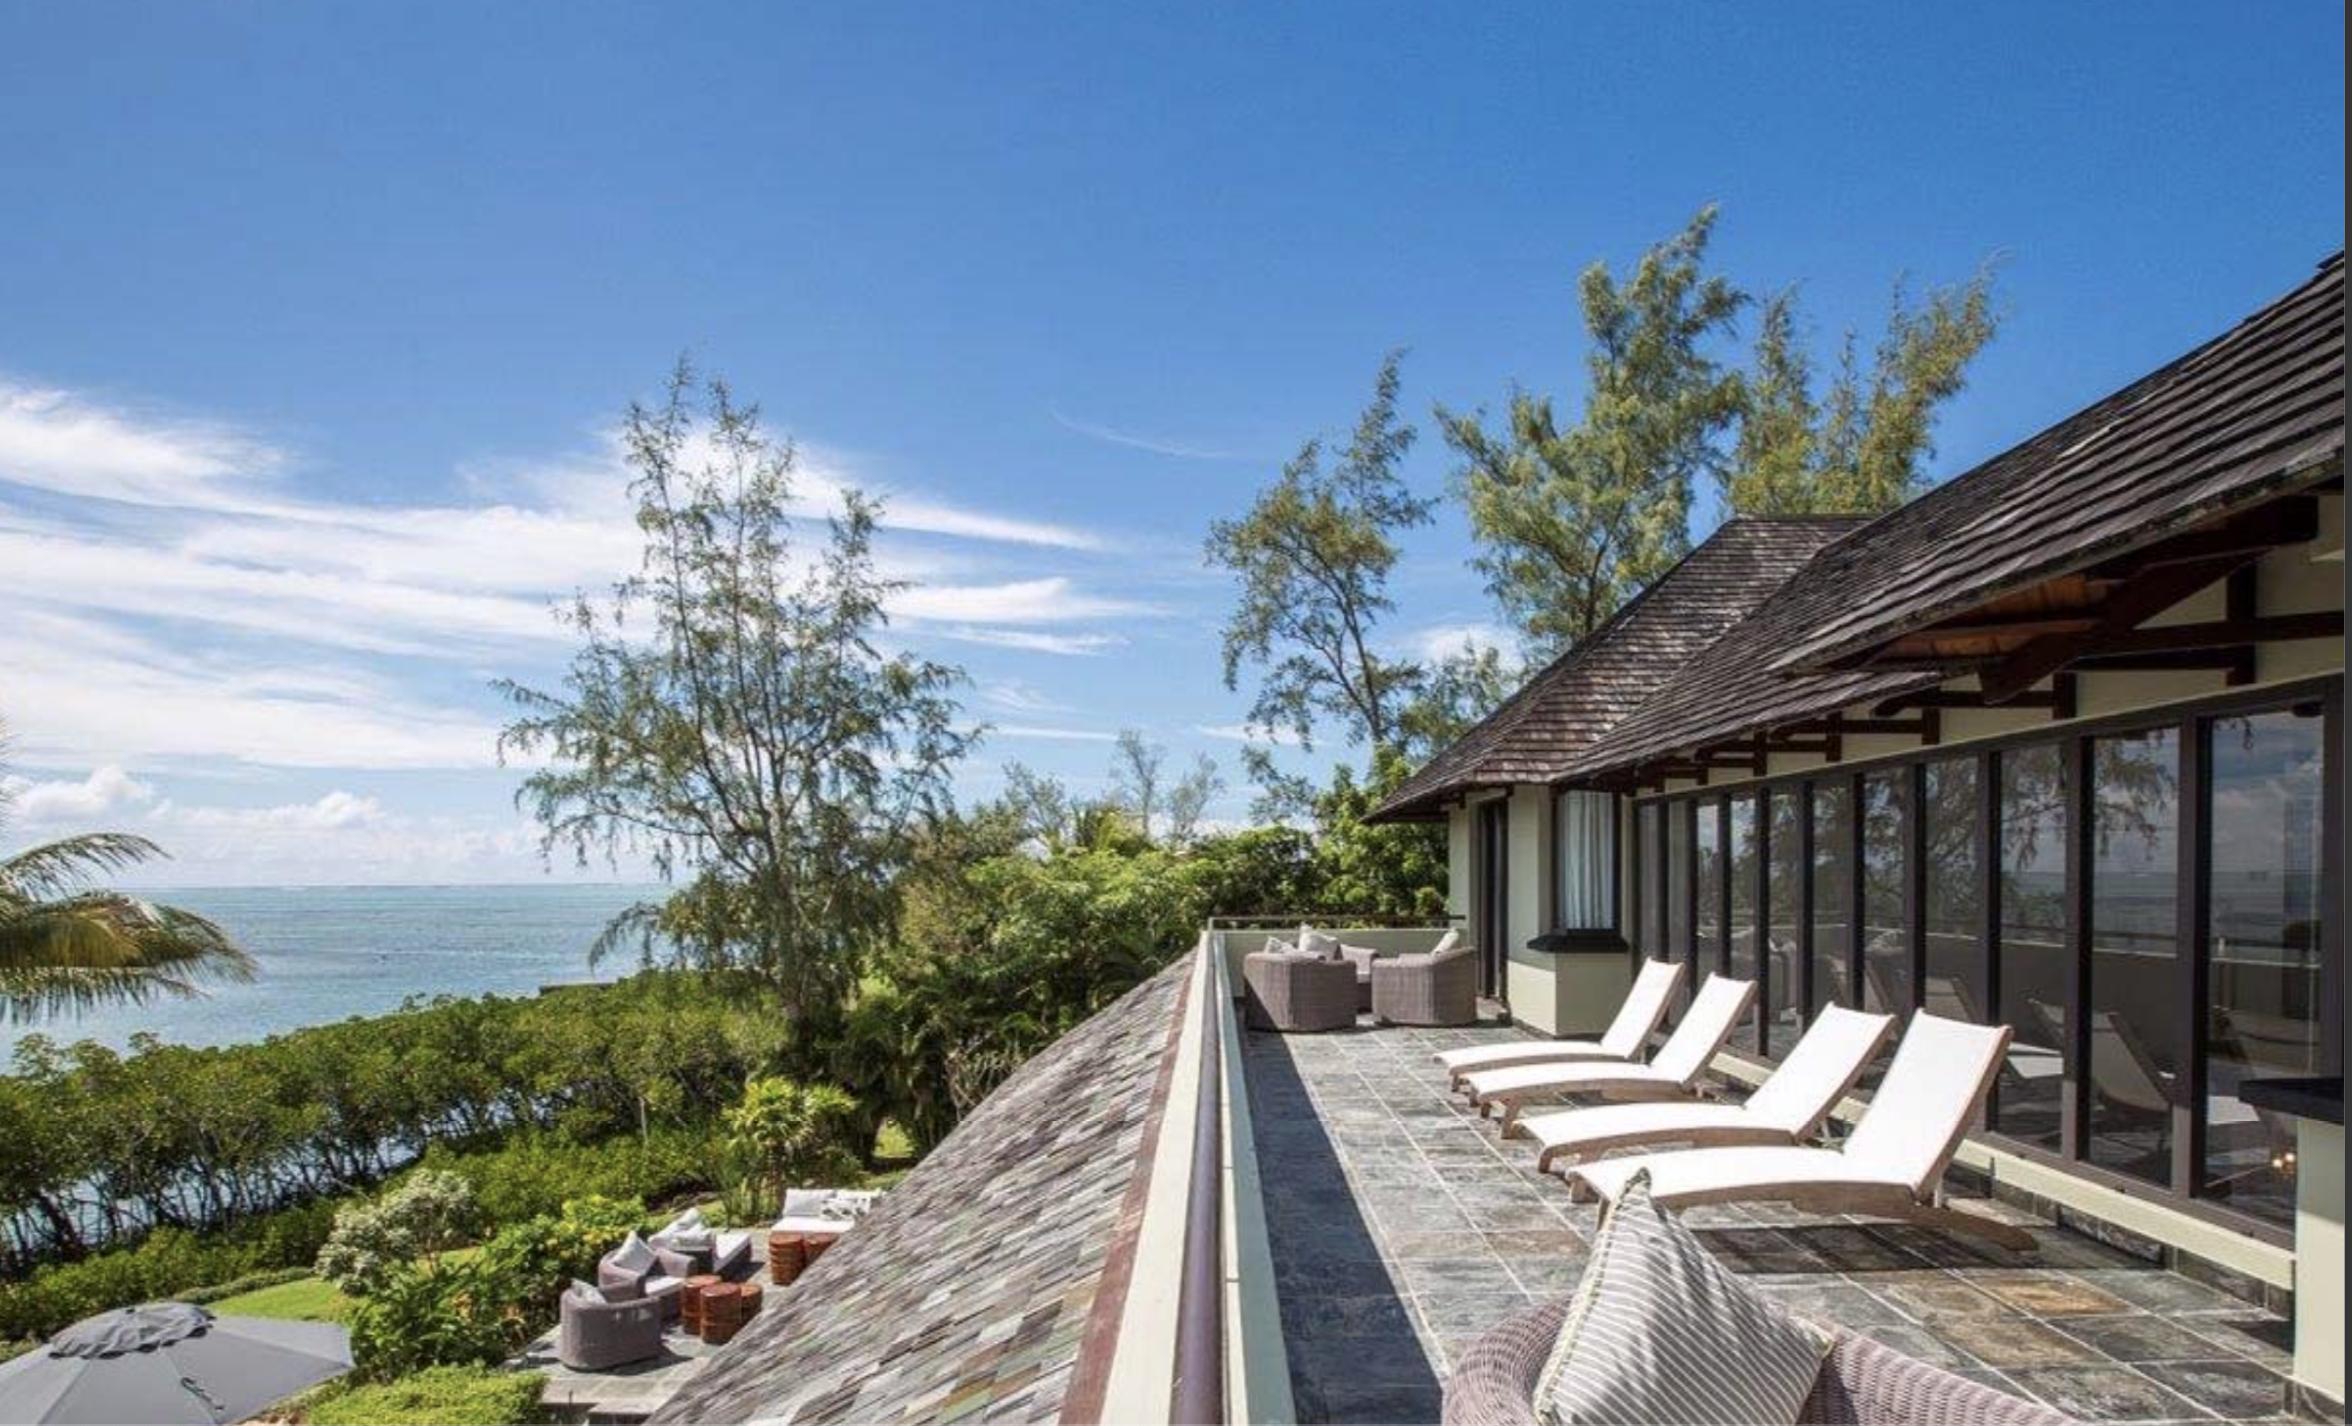 6 Bedroom Bungalow, For Sale – Four Seasons Resort, Mauritius at Anahita